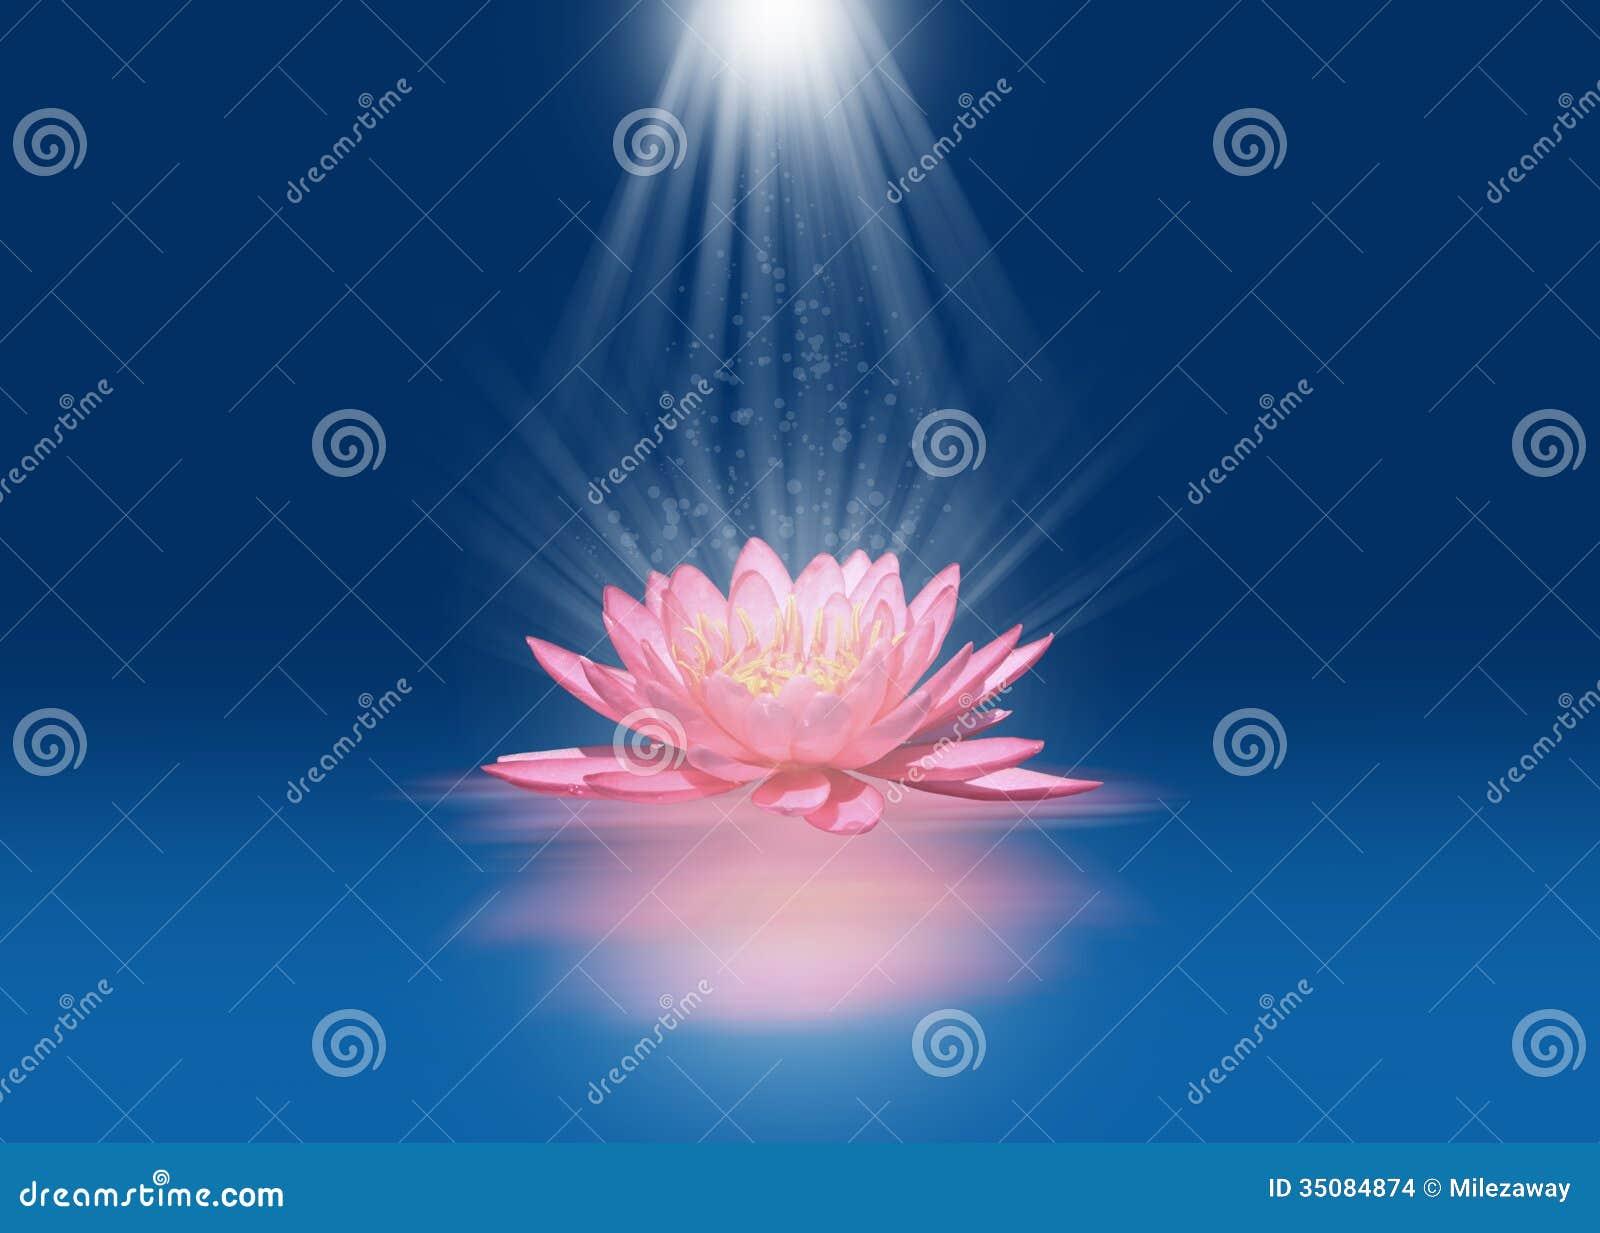 Pink flower background 1377212 - Light Pink Flower Wallpaper